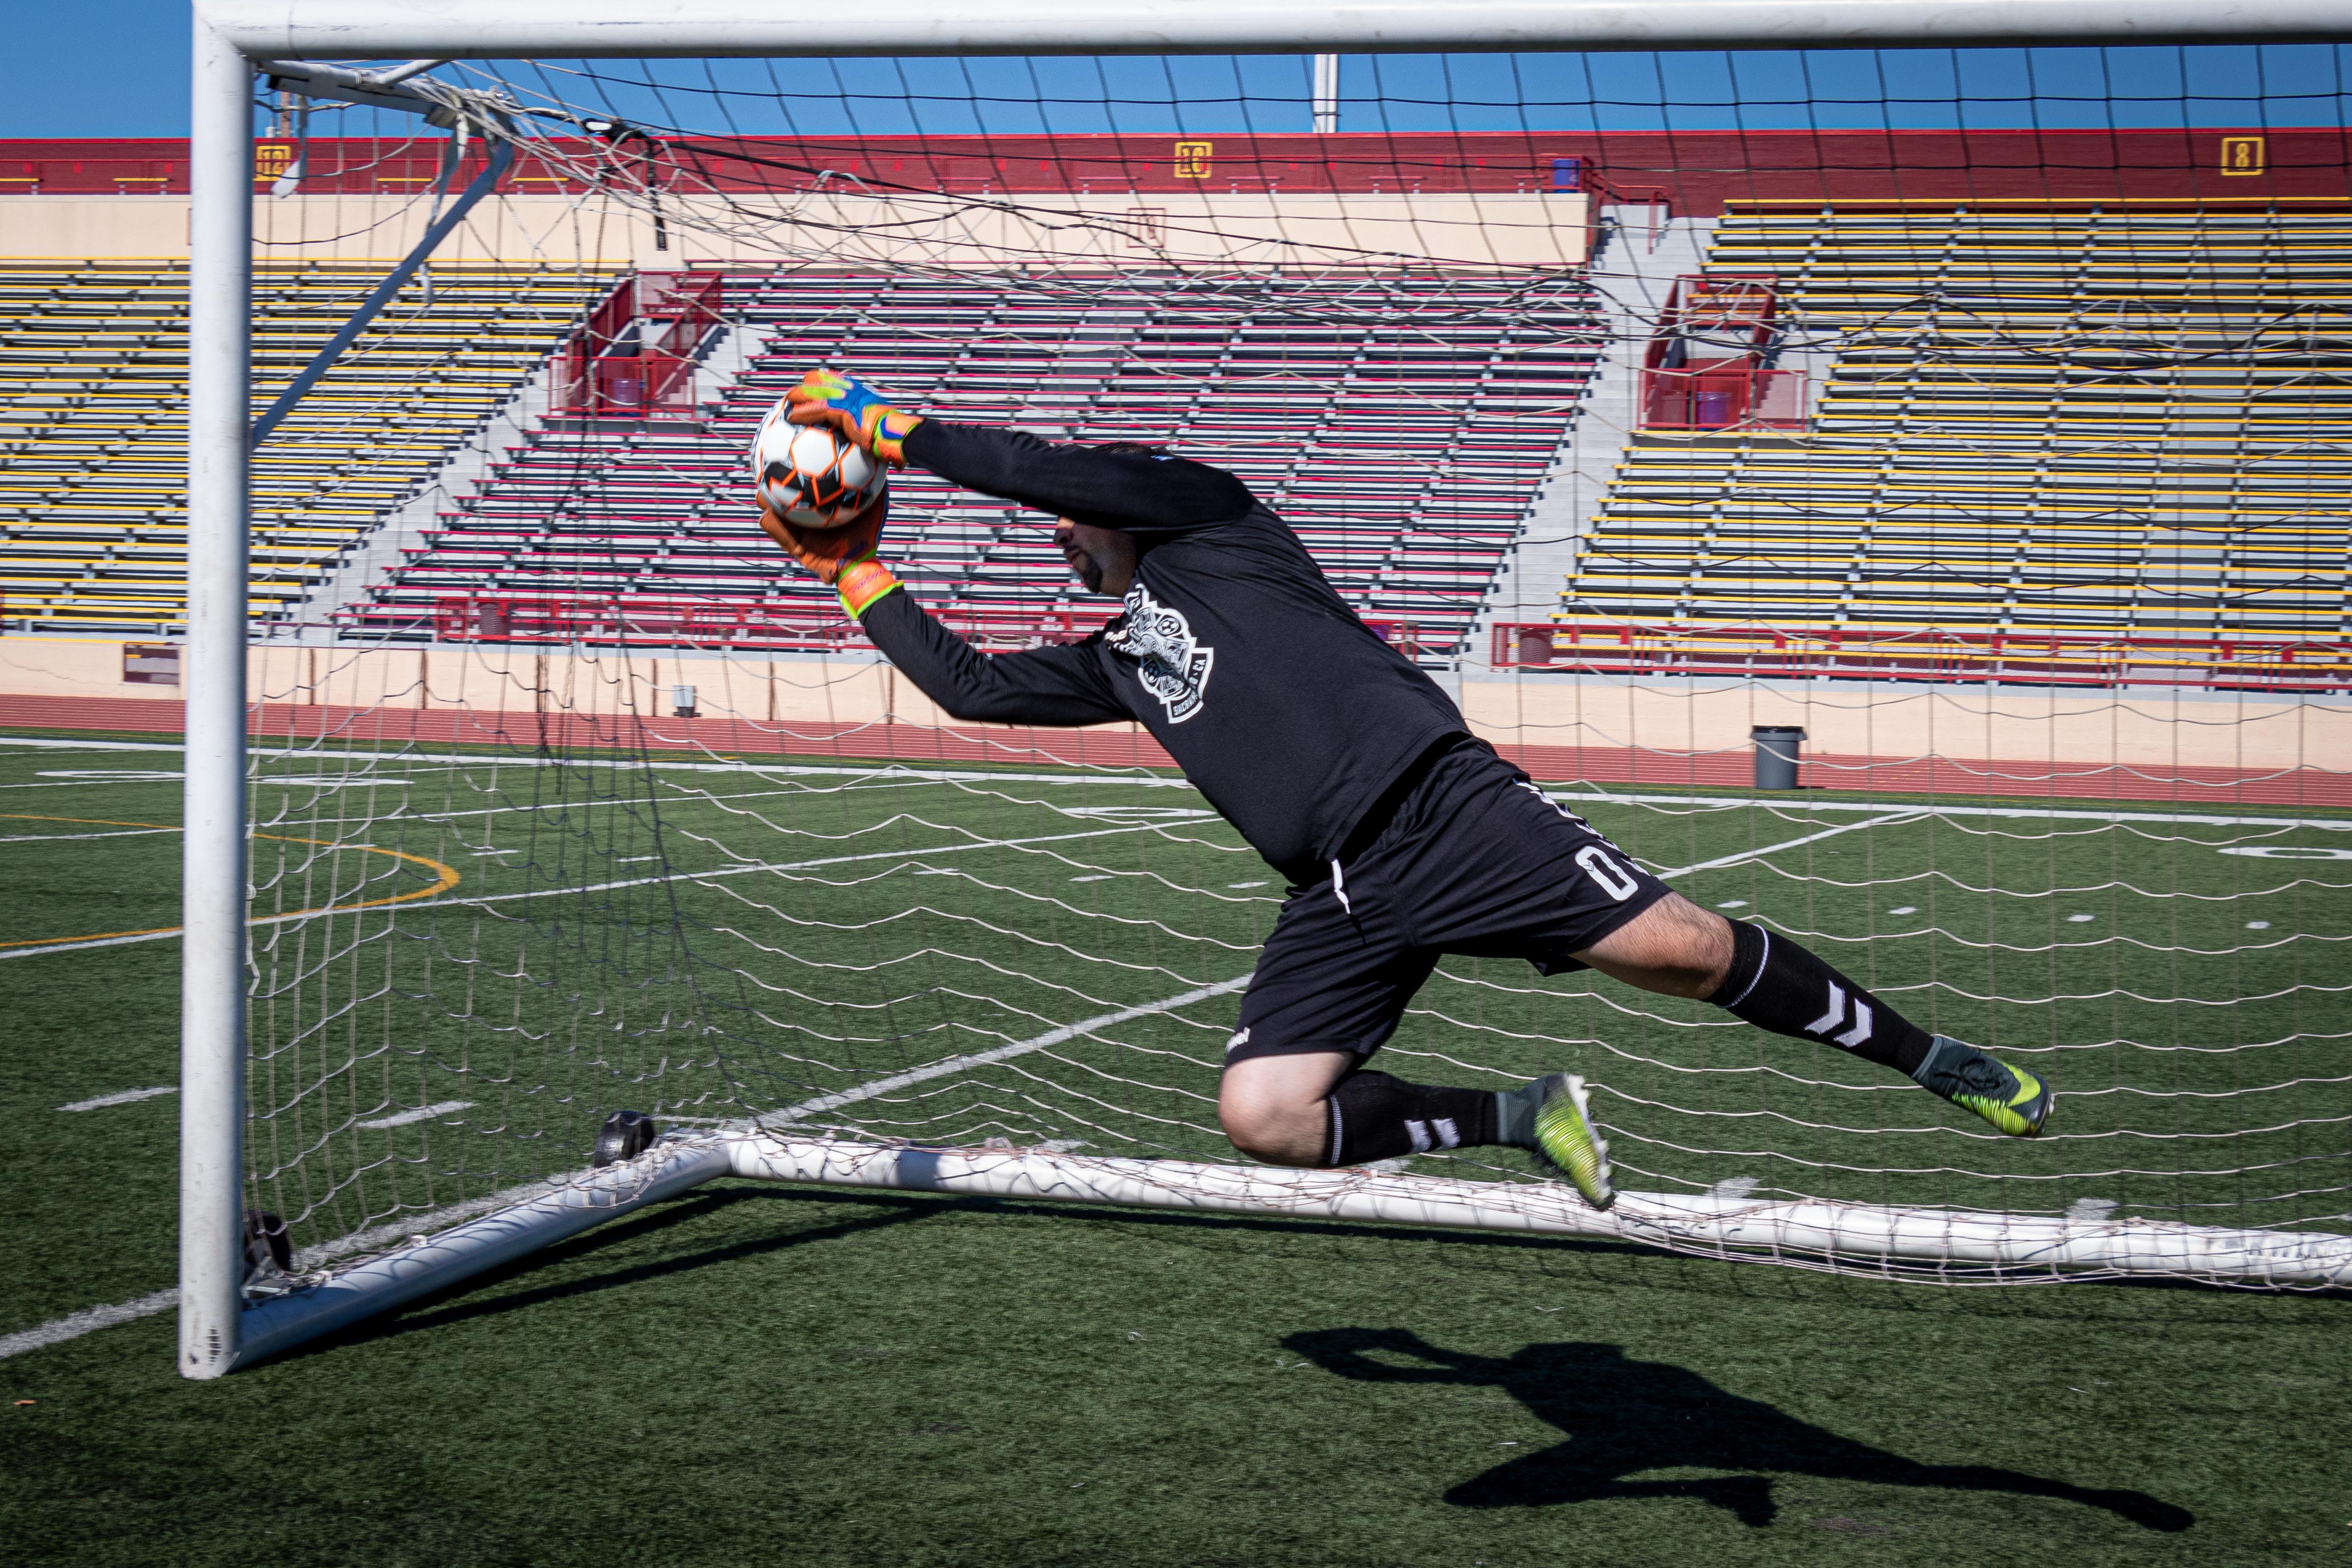 Goalkeeper.jpg